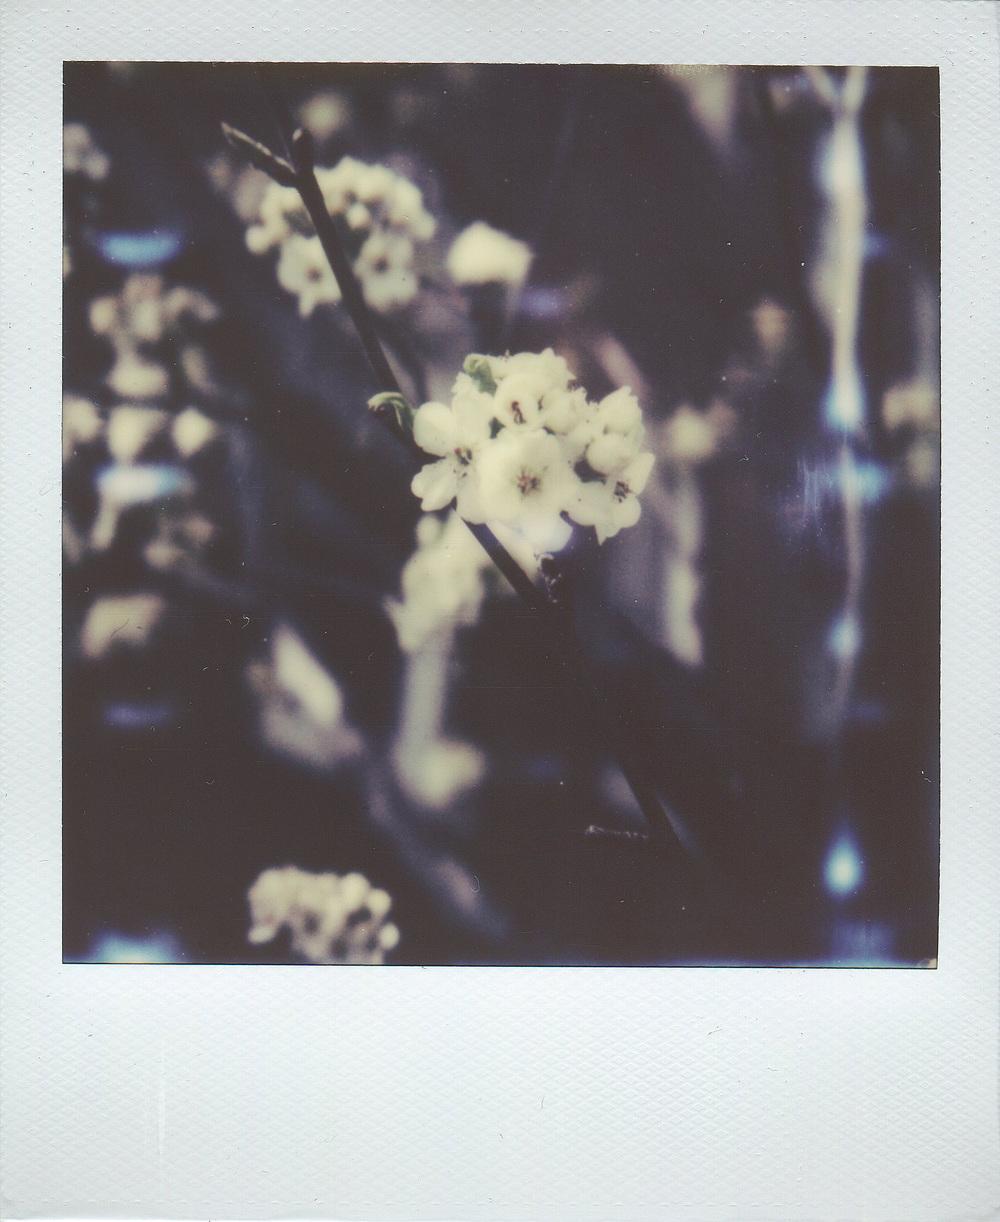 cherry-blossoms-April-2014-.jpg